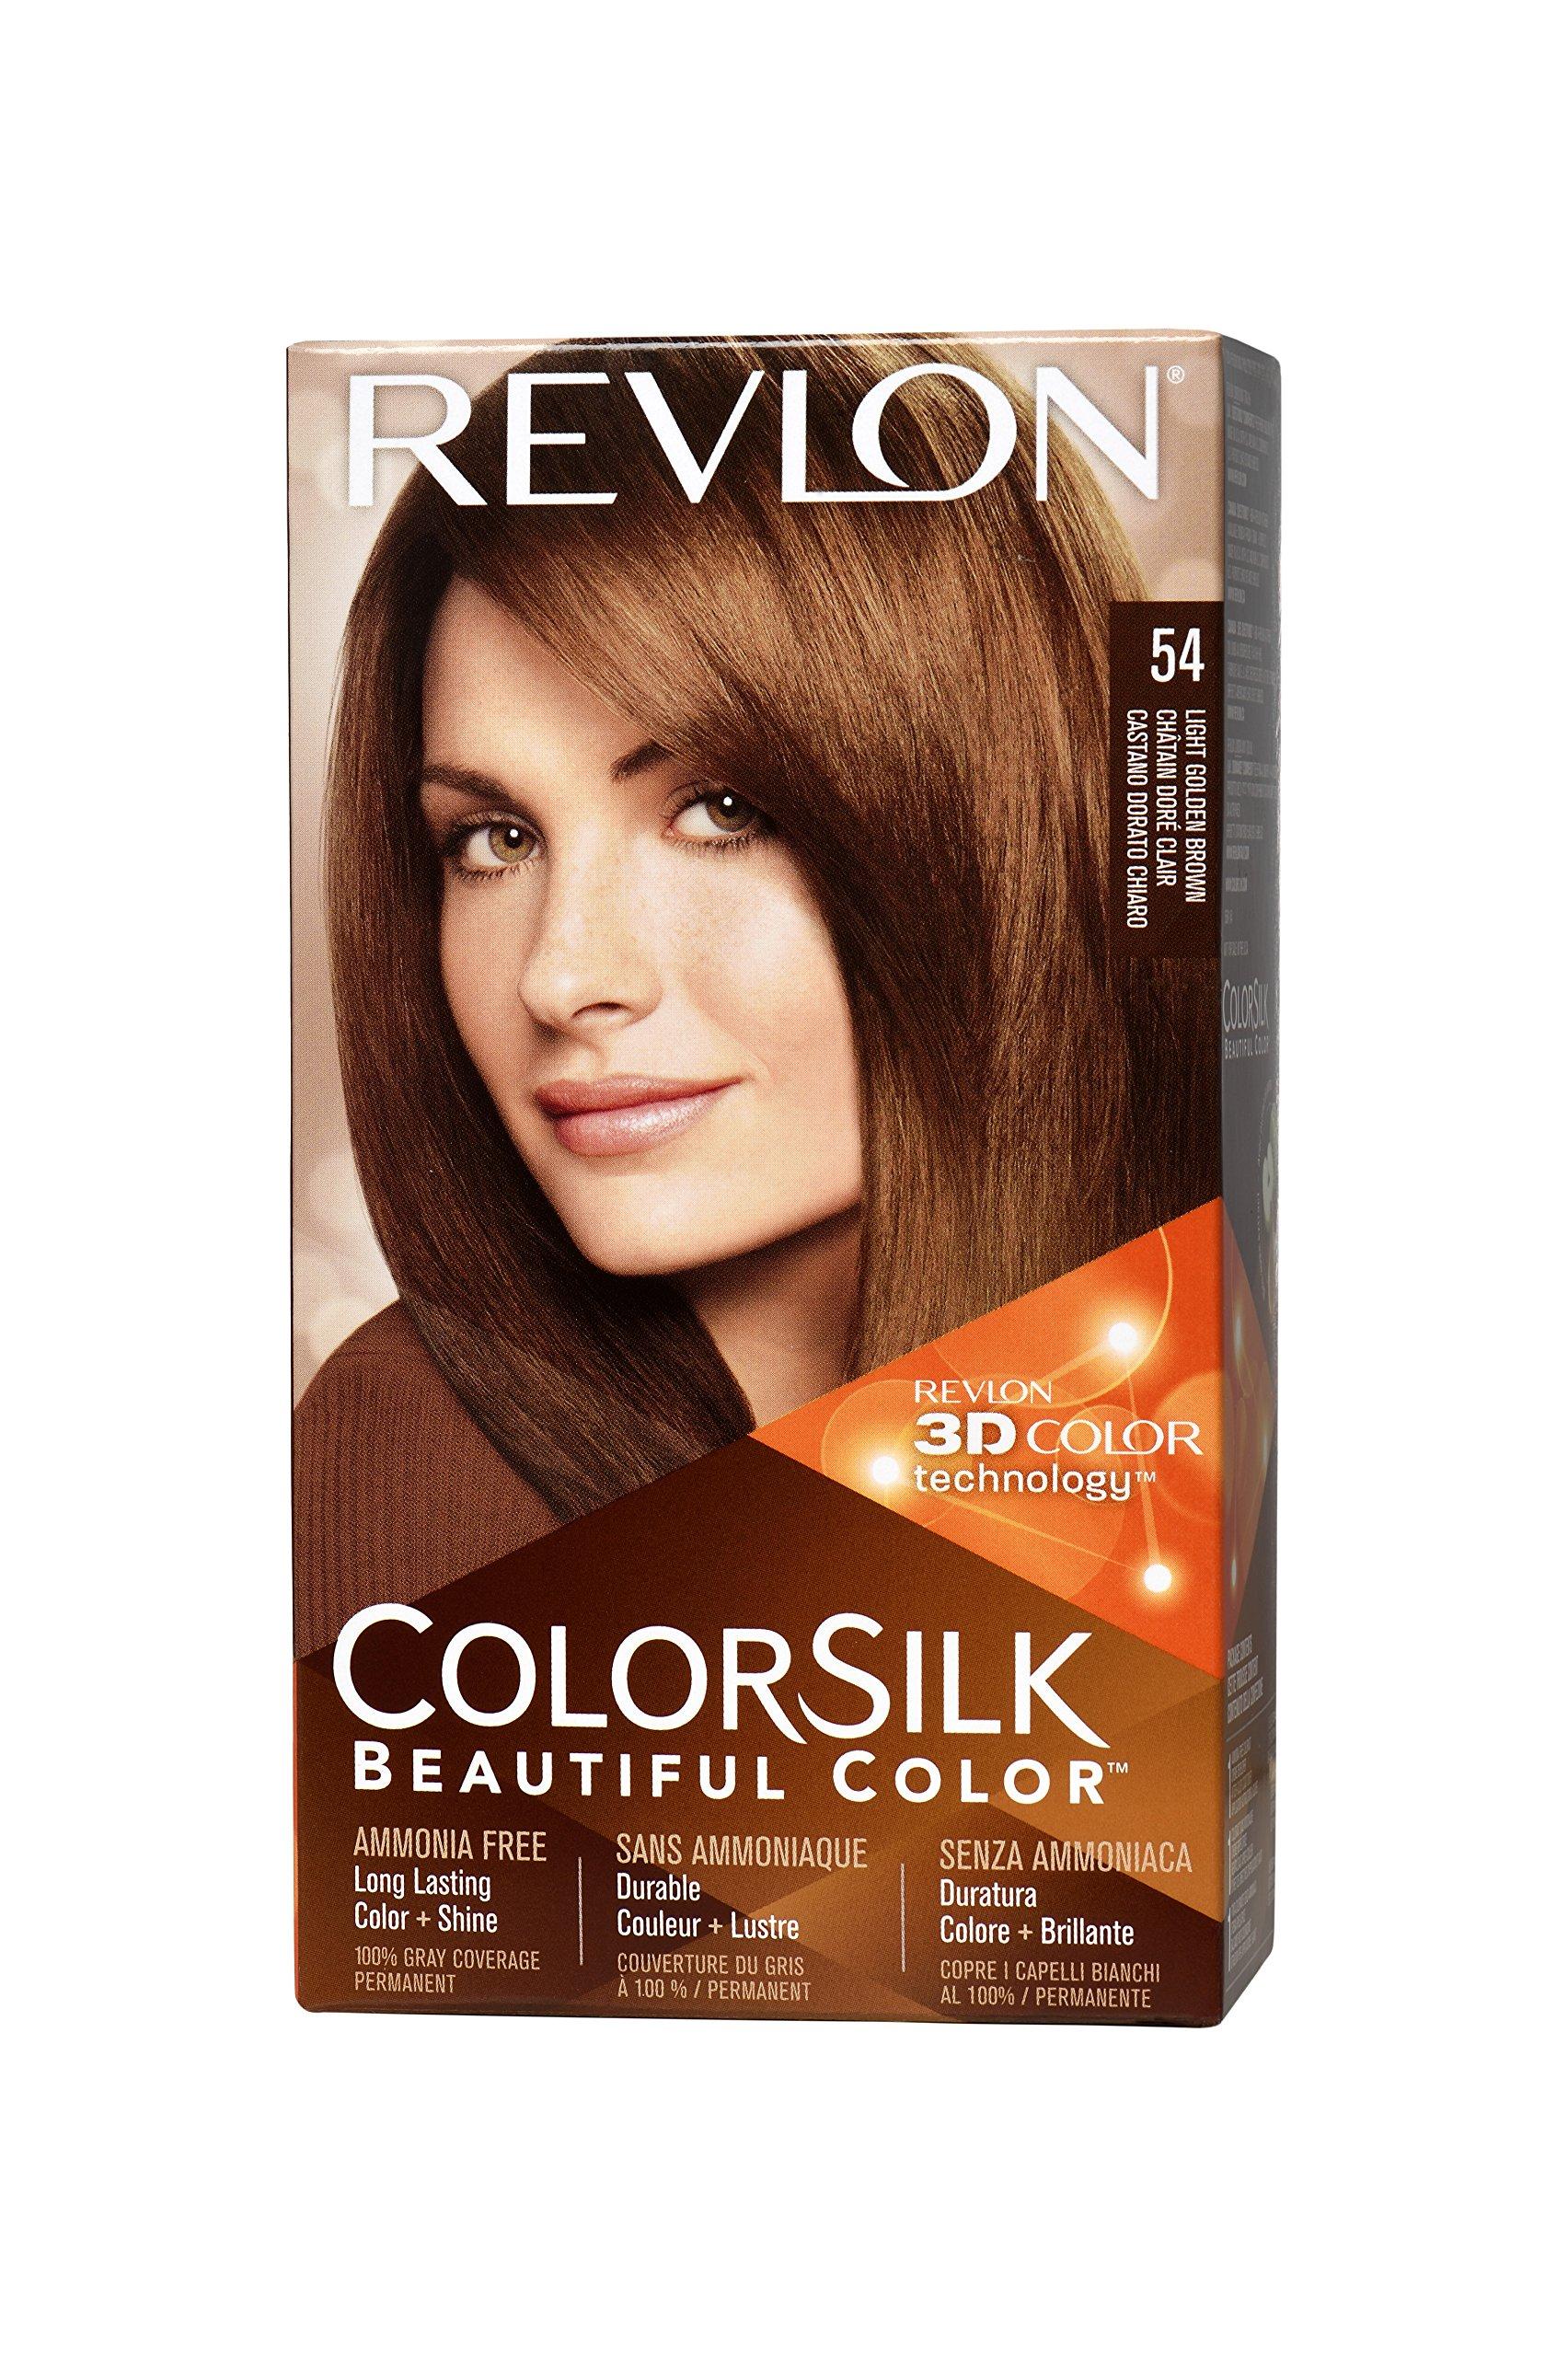 Colorsilk beautiful color 55 light reddish brown by revlon hair color - Revlon Colorsilk Haircolor Light Golden Brown Pack Of 3